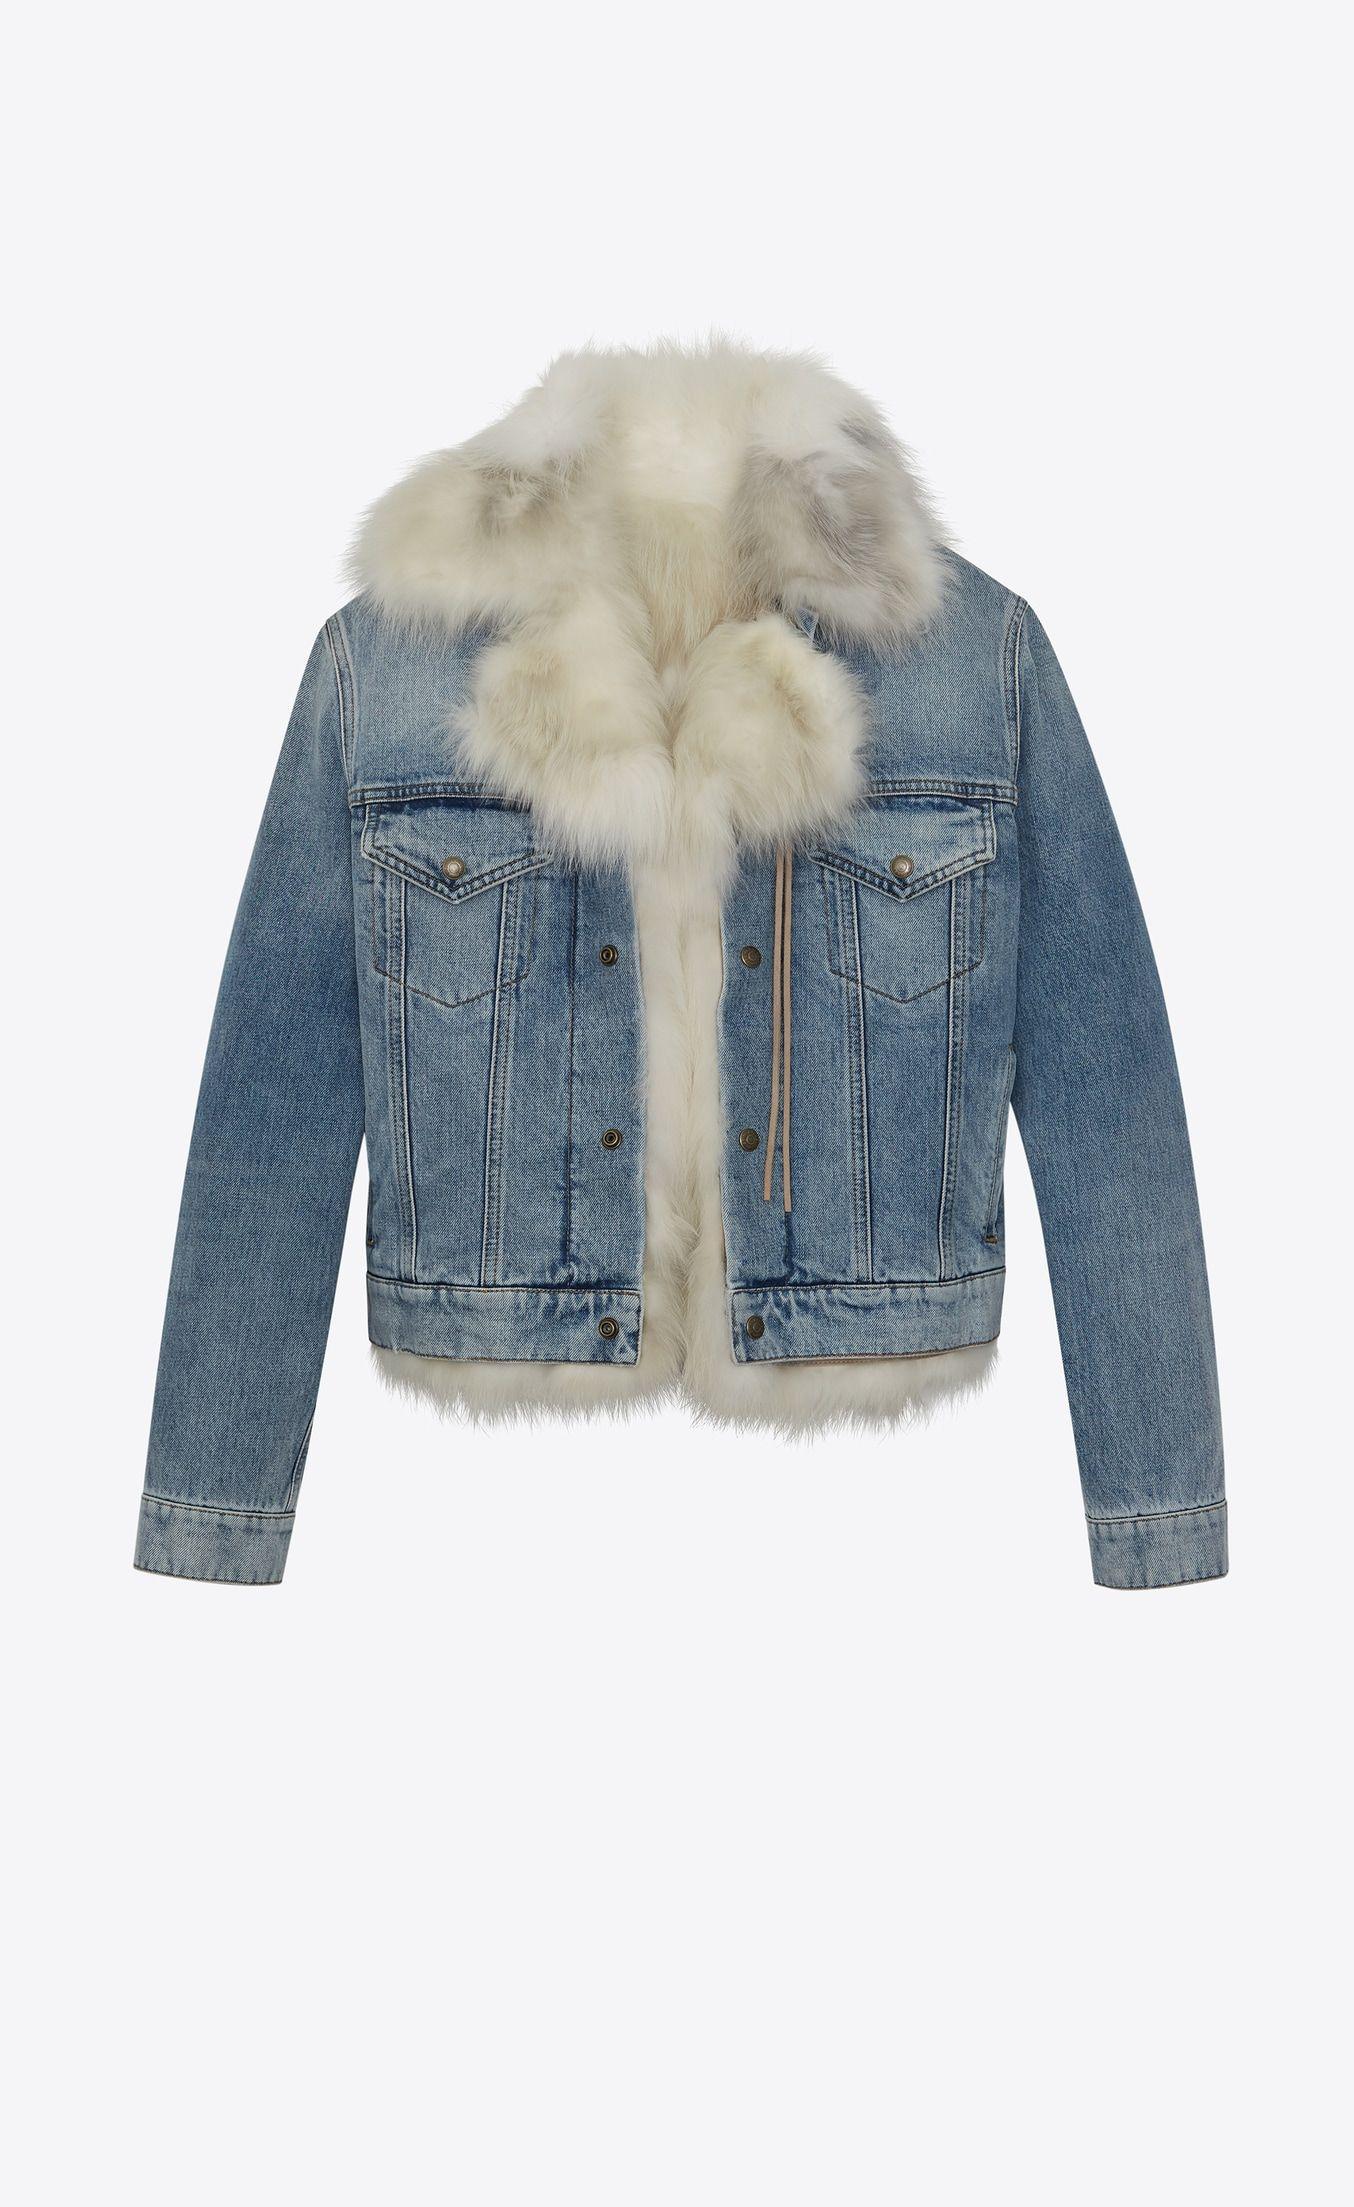 18ccc153ec6 Fur lined denim jacket in 2019 | Yves Saint Laurent | Fur lined ...